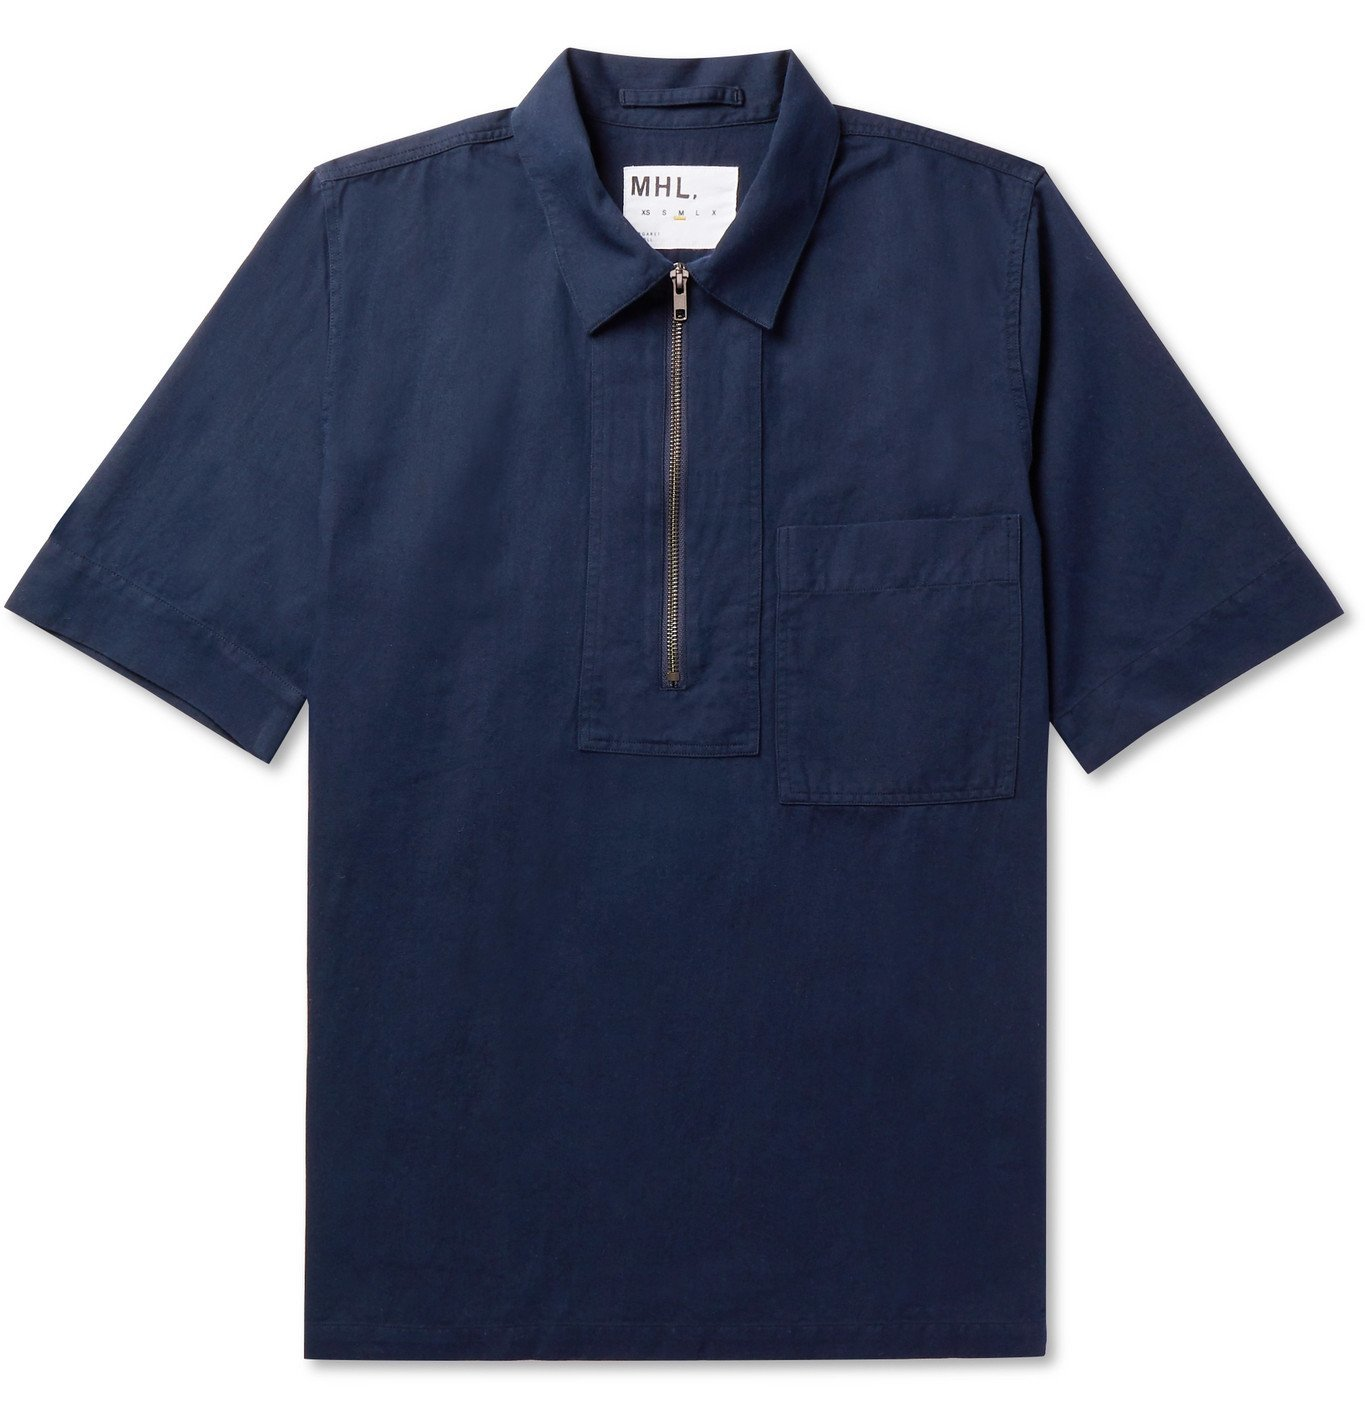 Margaret Howell - Cotton and Linen-Blend Half-Zip Polo Shirt - Blue